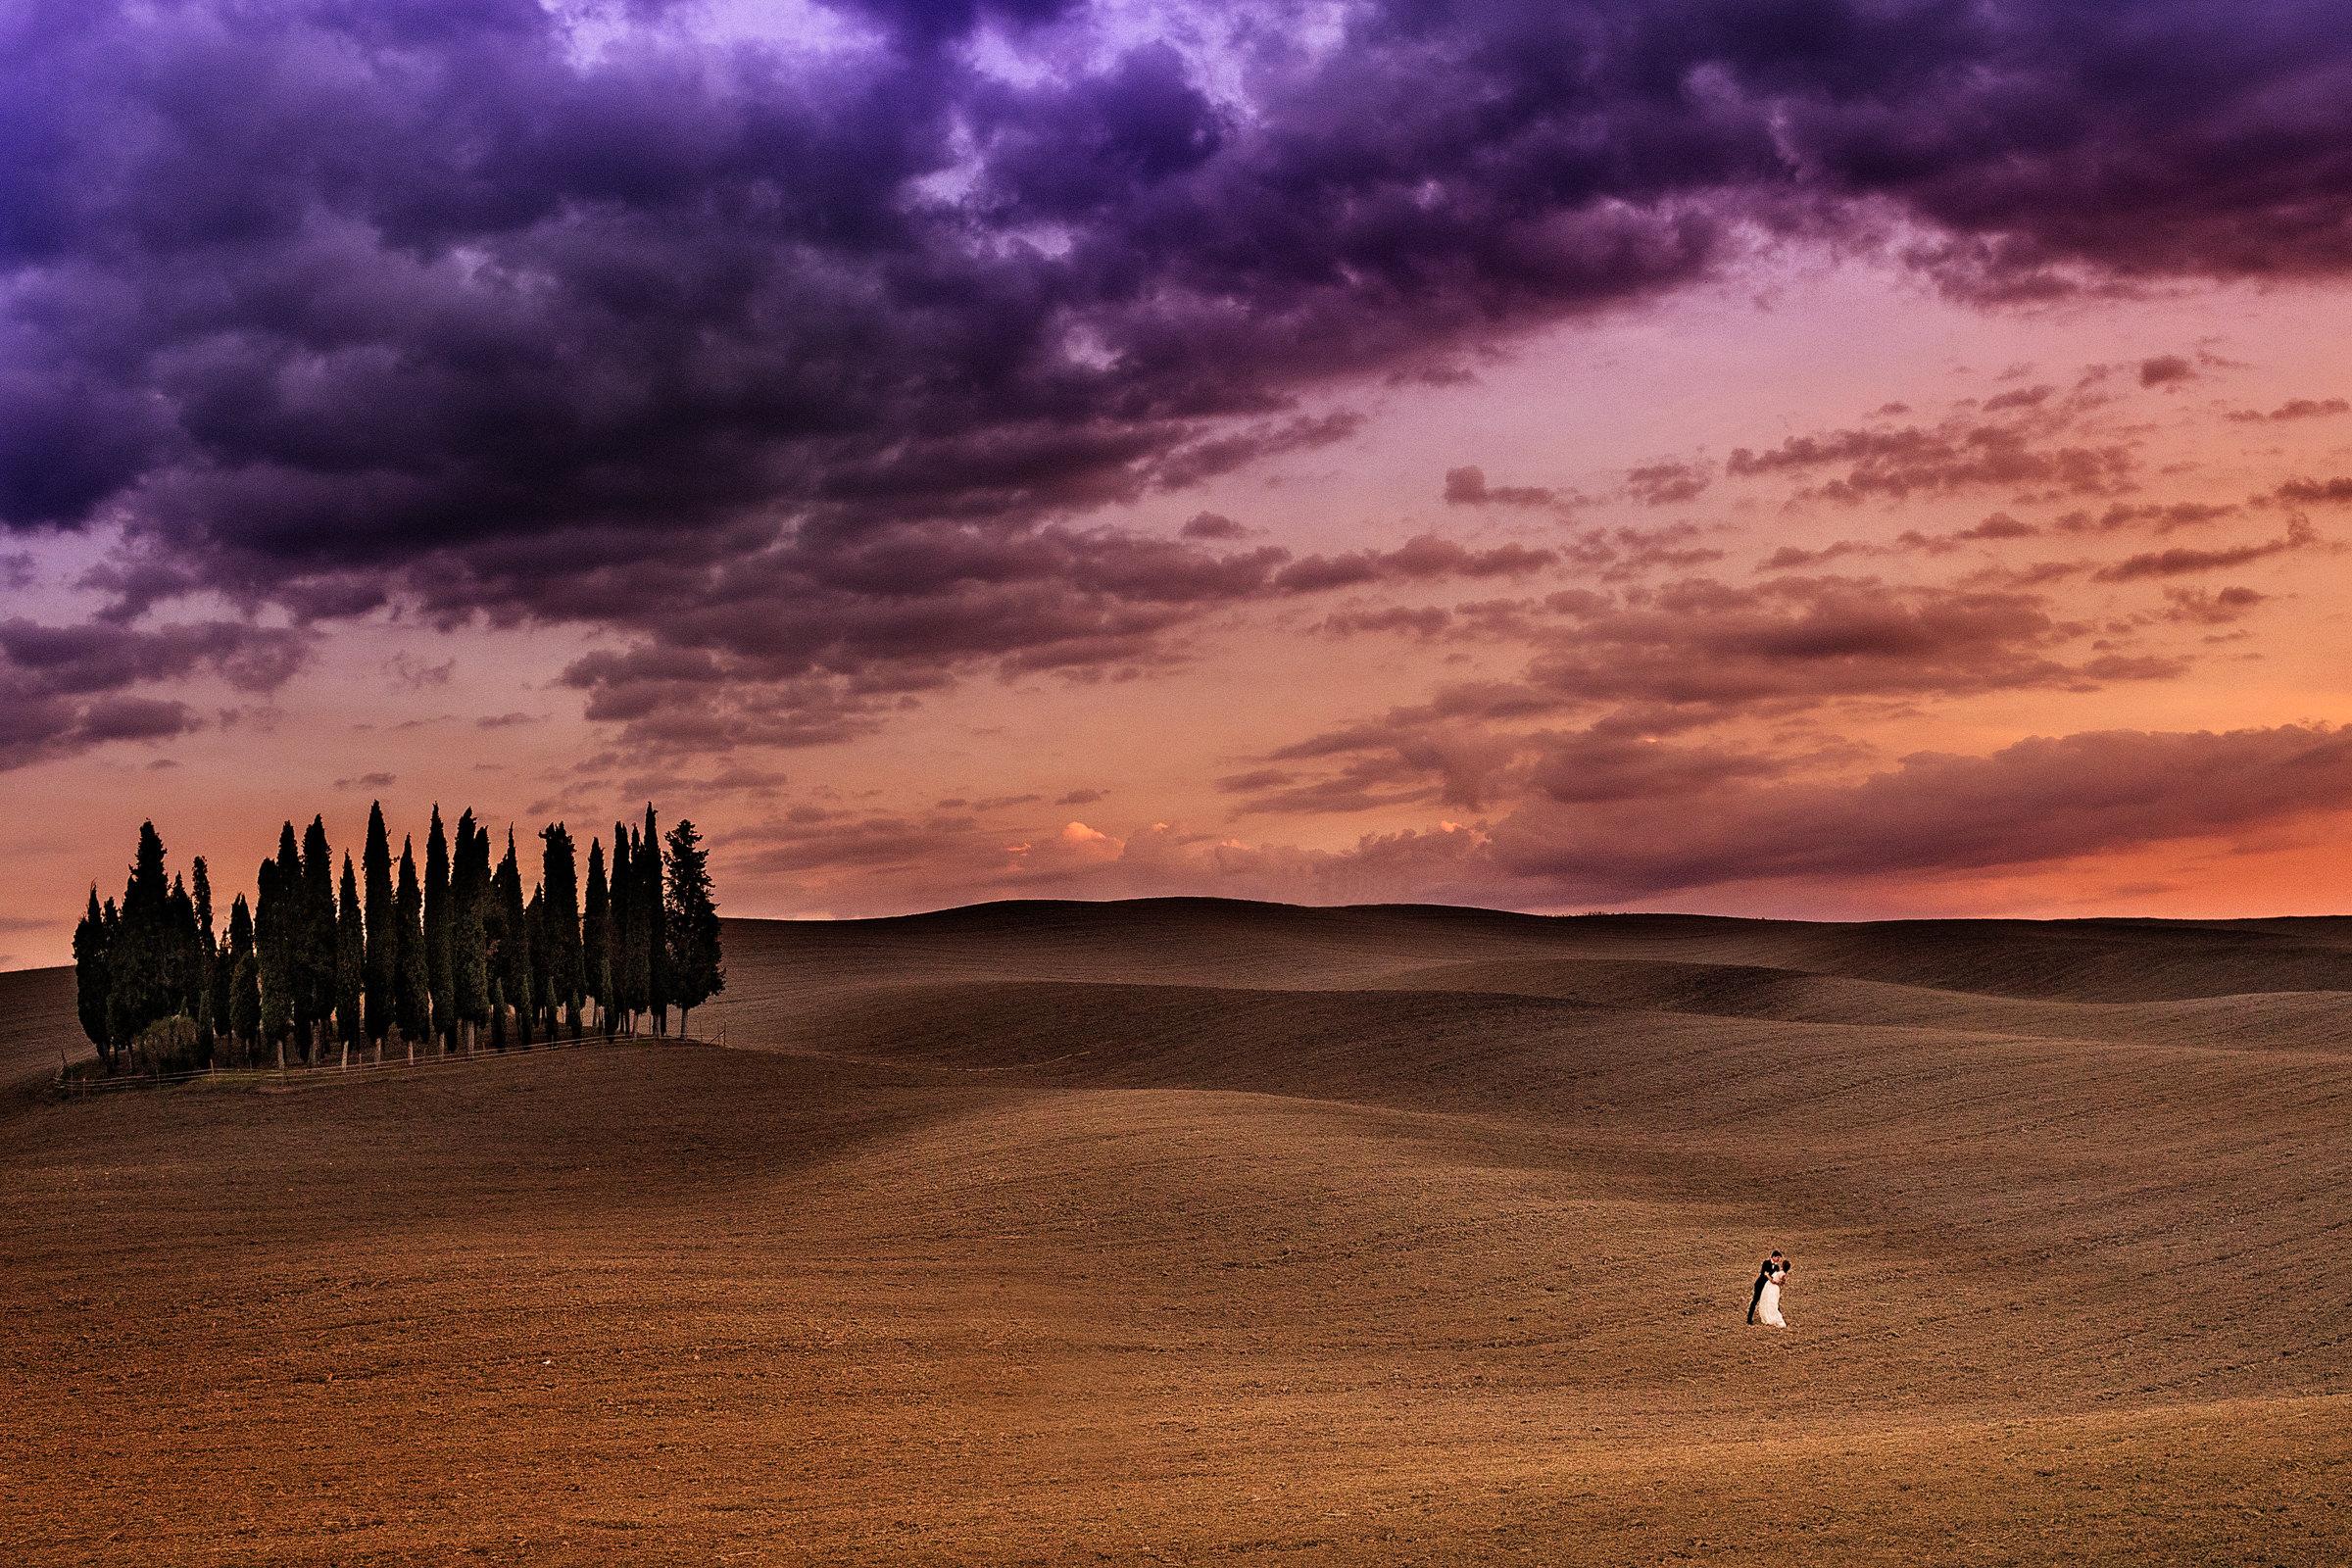 couple-in-epic-landscape-d2-photography